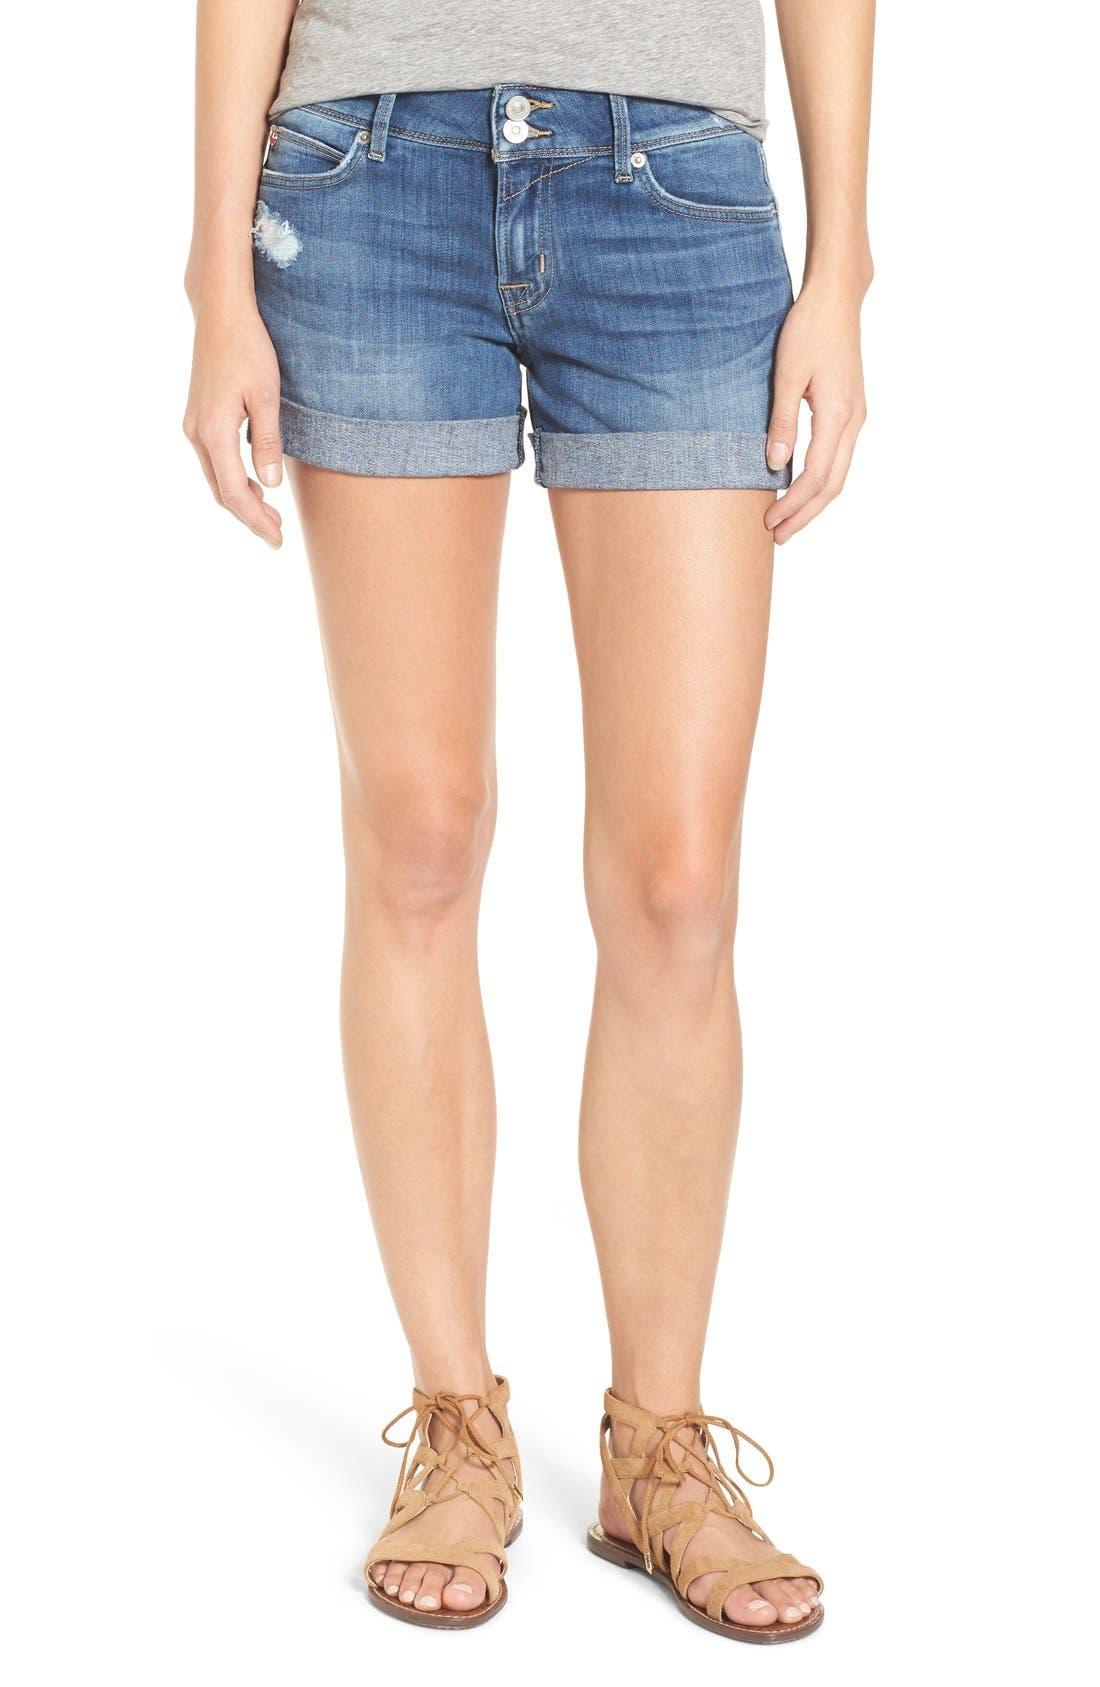 Main Image - Hudson Jeans 'Croxley' Cuffed Denim Shorts (Paramour)